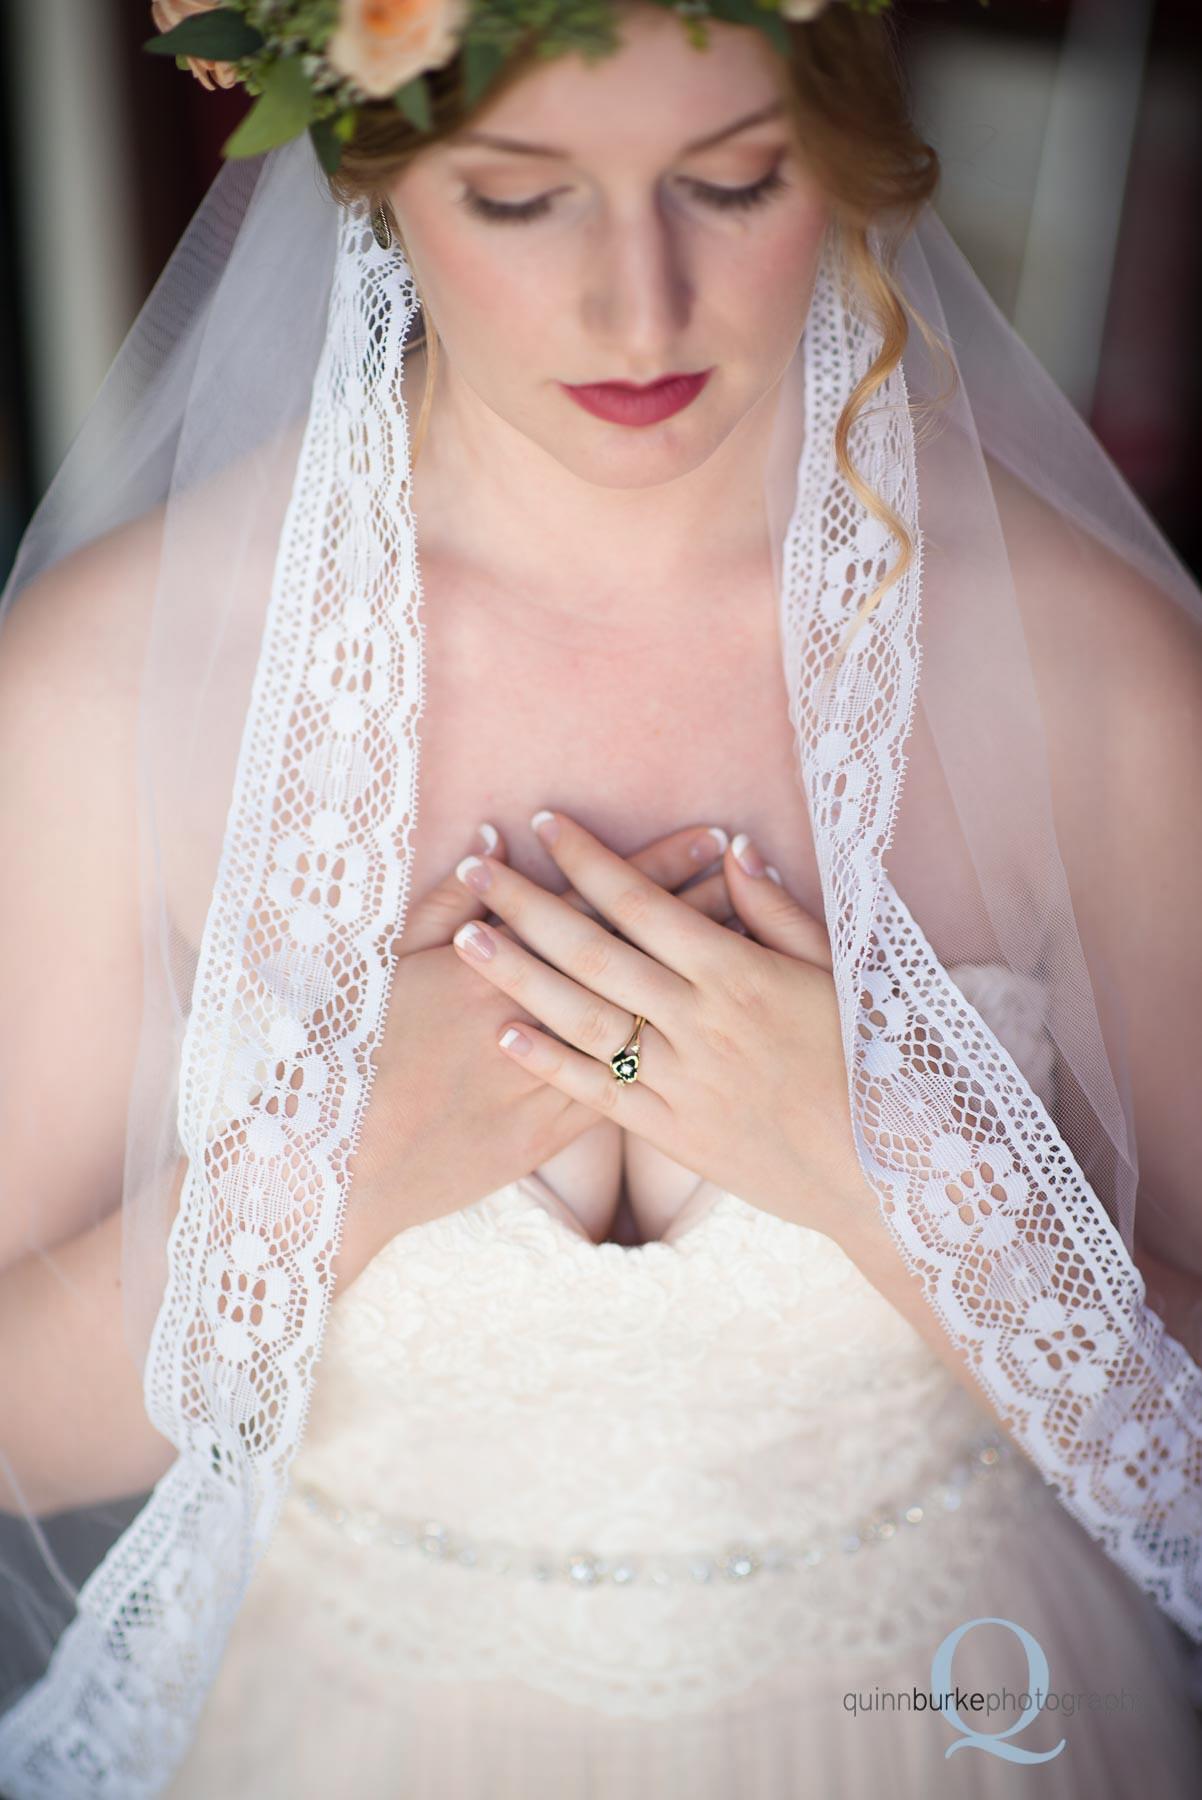 bridal veil and rings before wedding Perryhill Farm